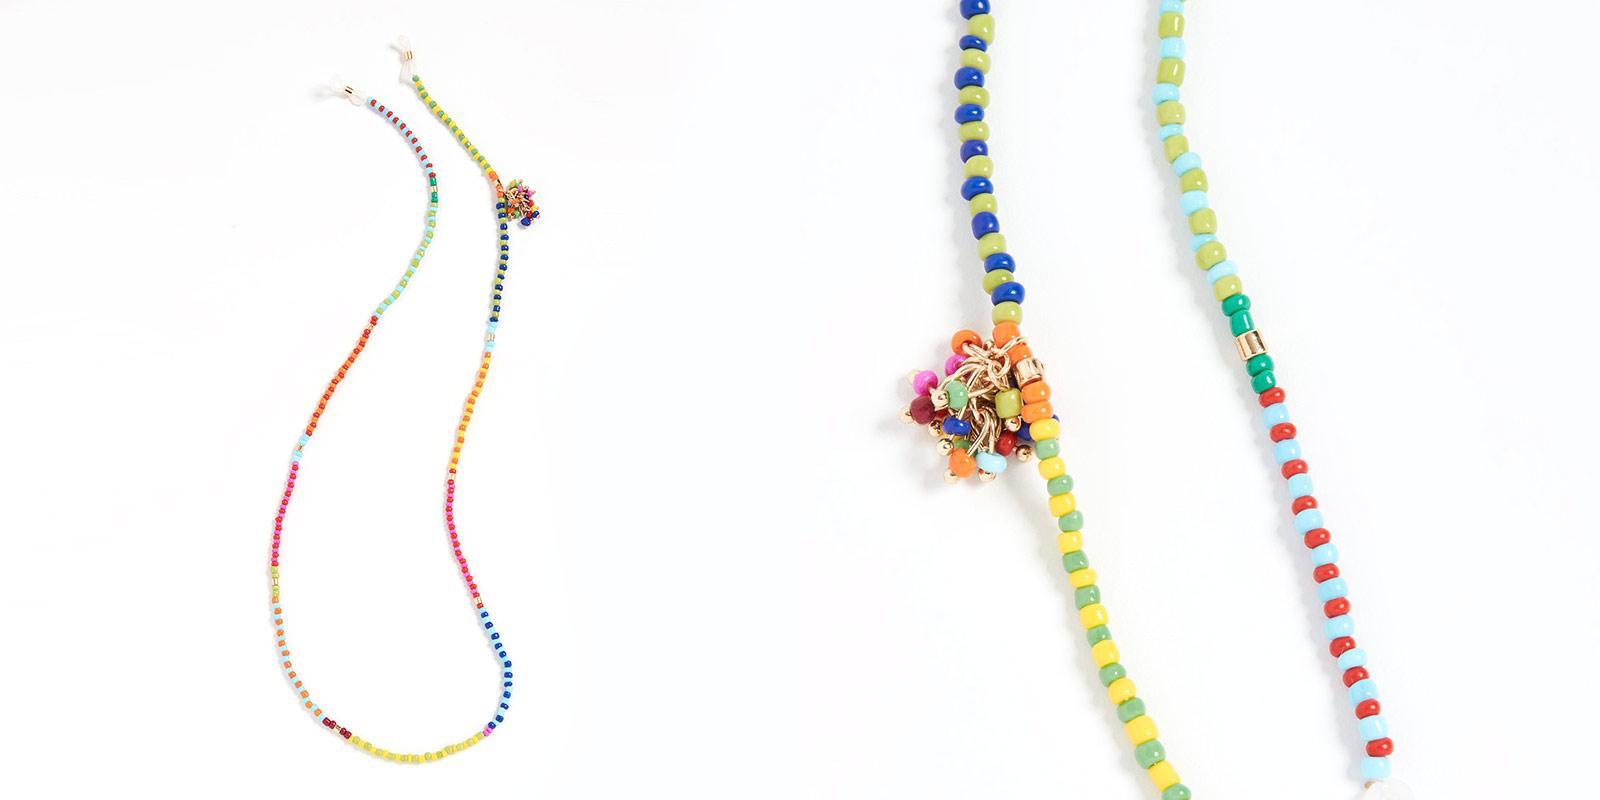 Glasses Chain10060-Multicolor--Plastic-Eyeglasses-additional2